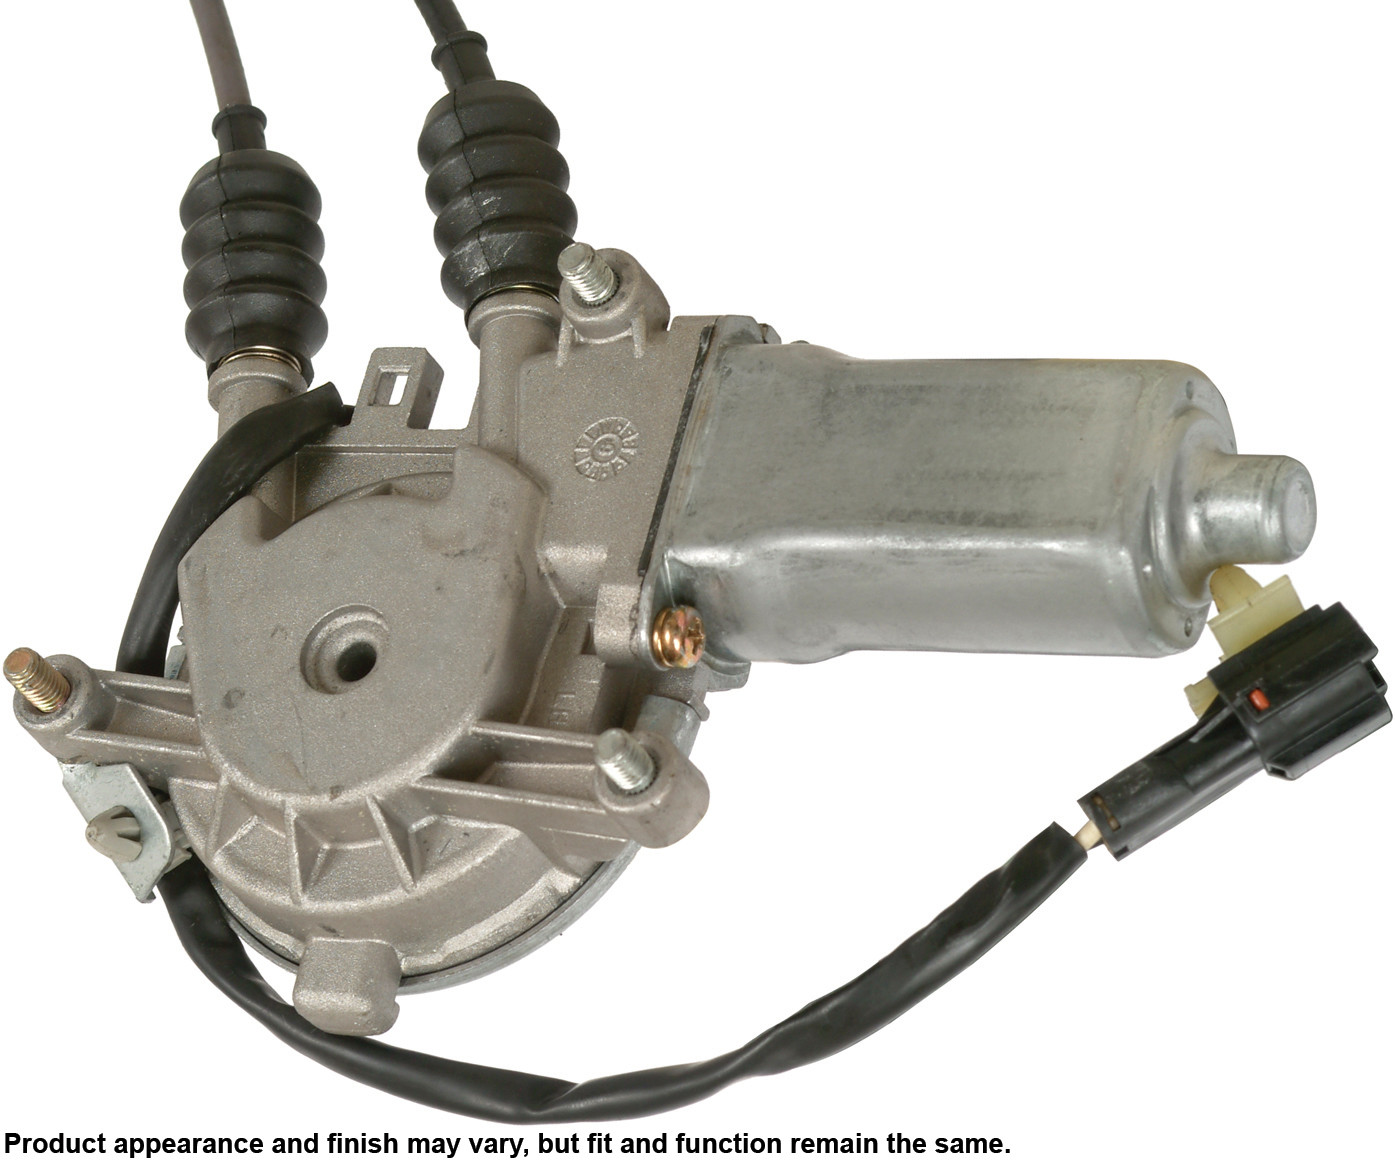 Imagen de Motor de Ventana eléctrica para Kia Sportage 2001 2002 Marca CARDONE Remanufacturado Número de Parte 47-45037